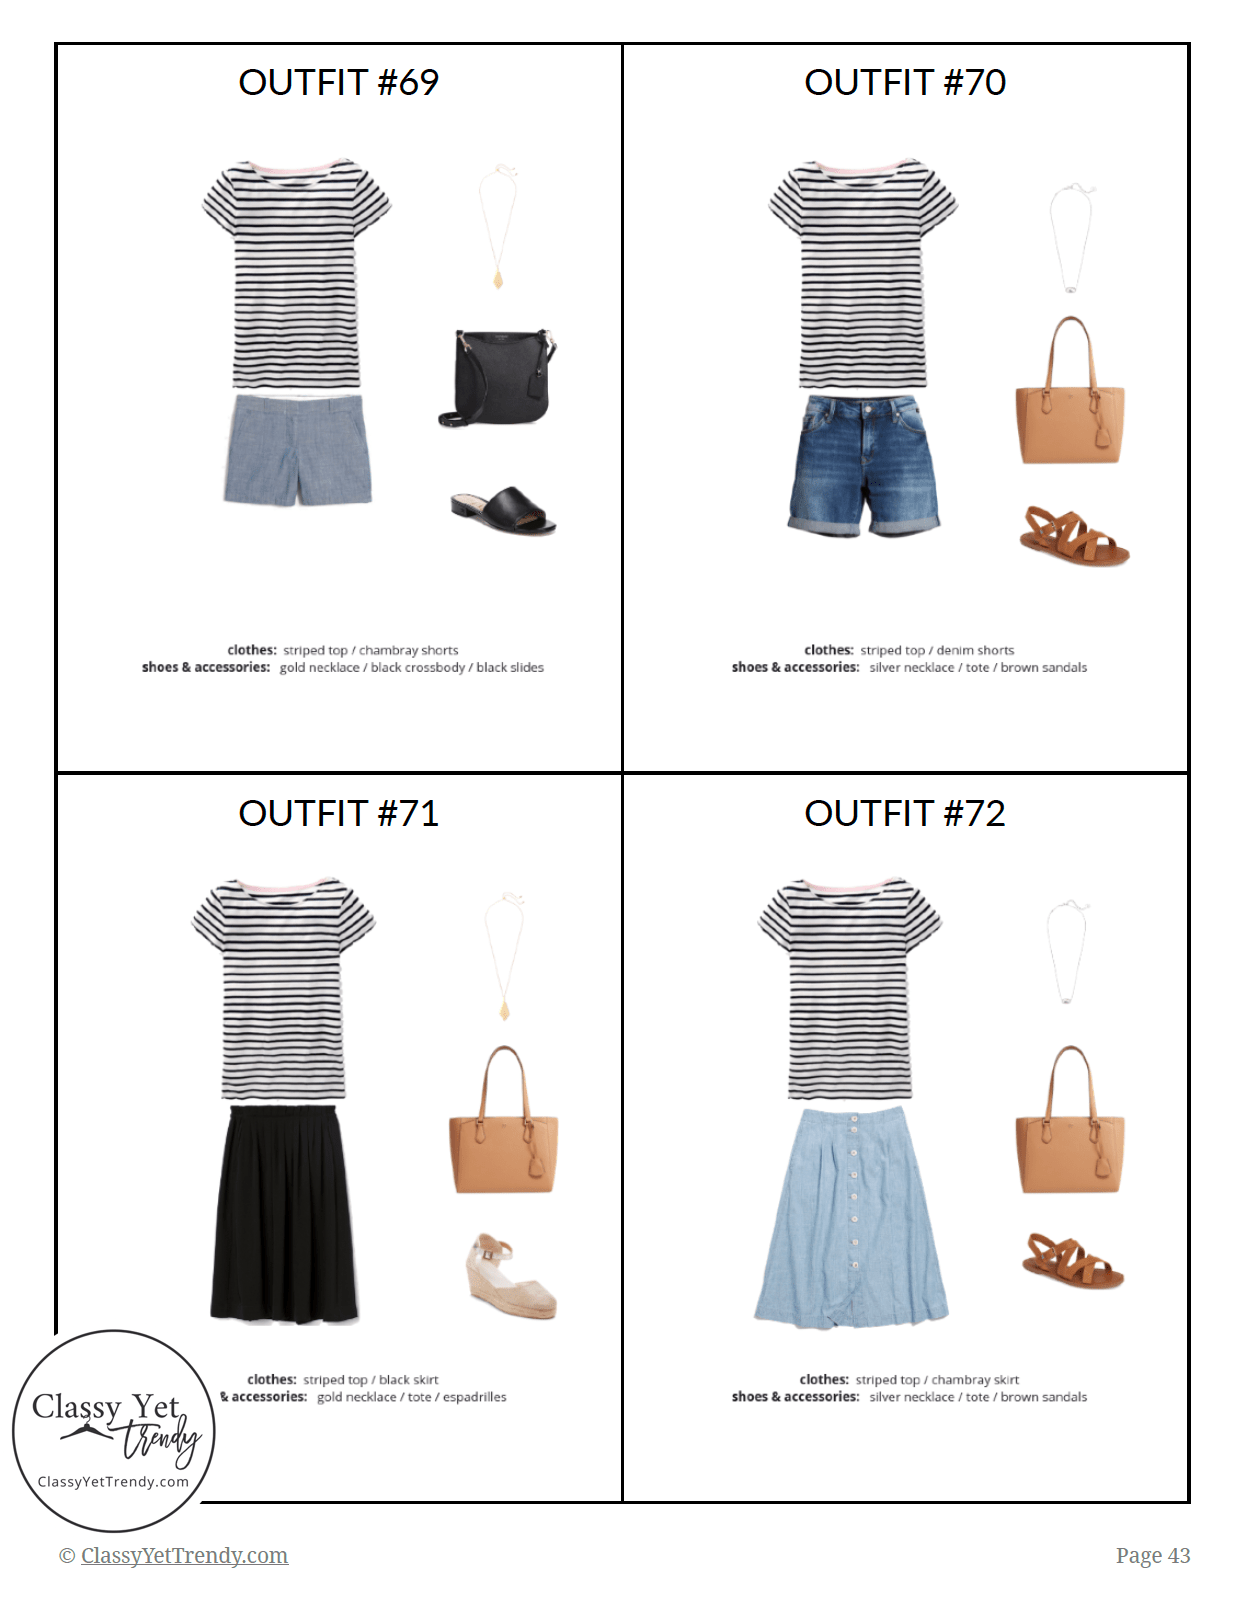 The French Minimalist Capsule Wardrobe Summer 2019